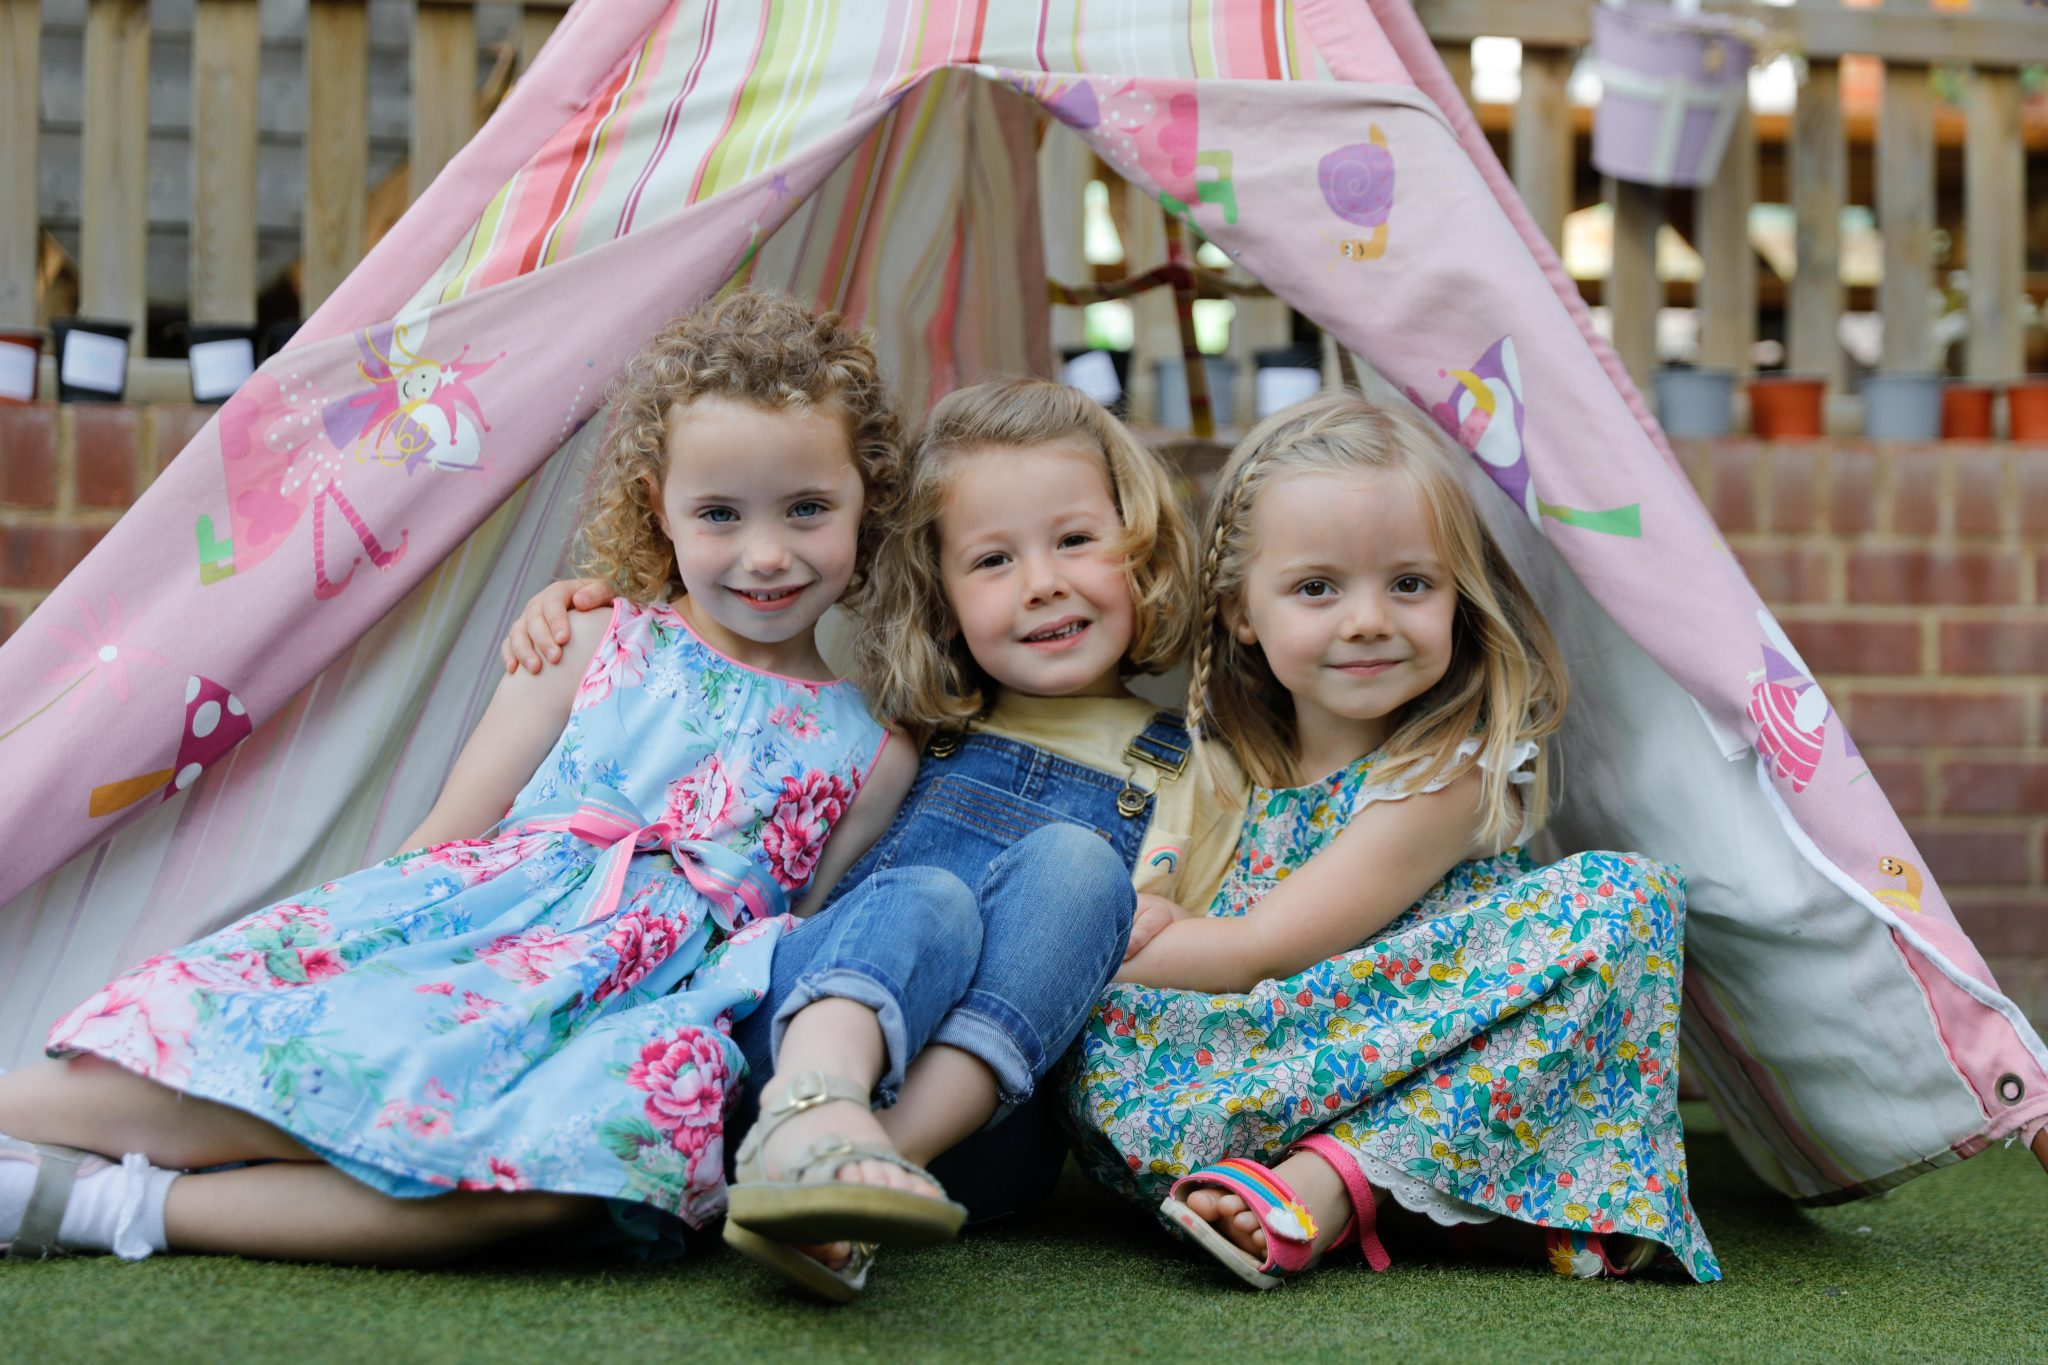 st marys nursery henley, private nursery henley, preschool henley, henley preschool